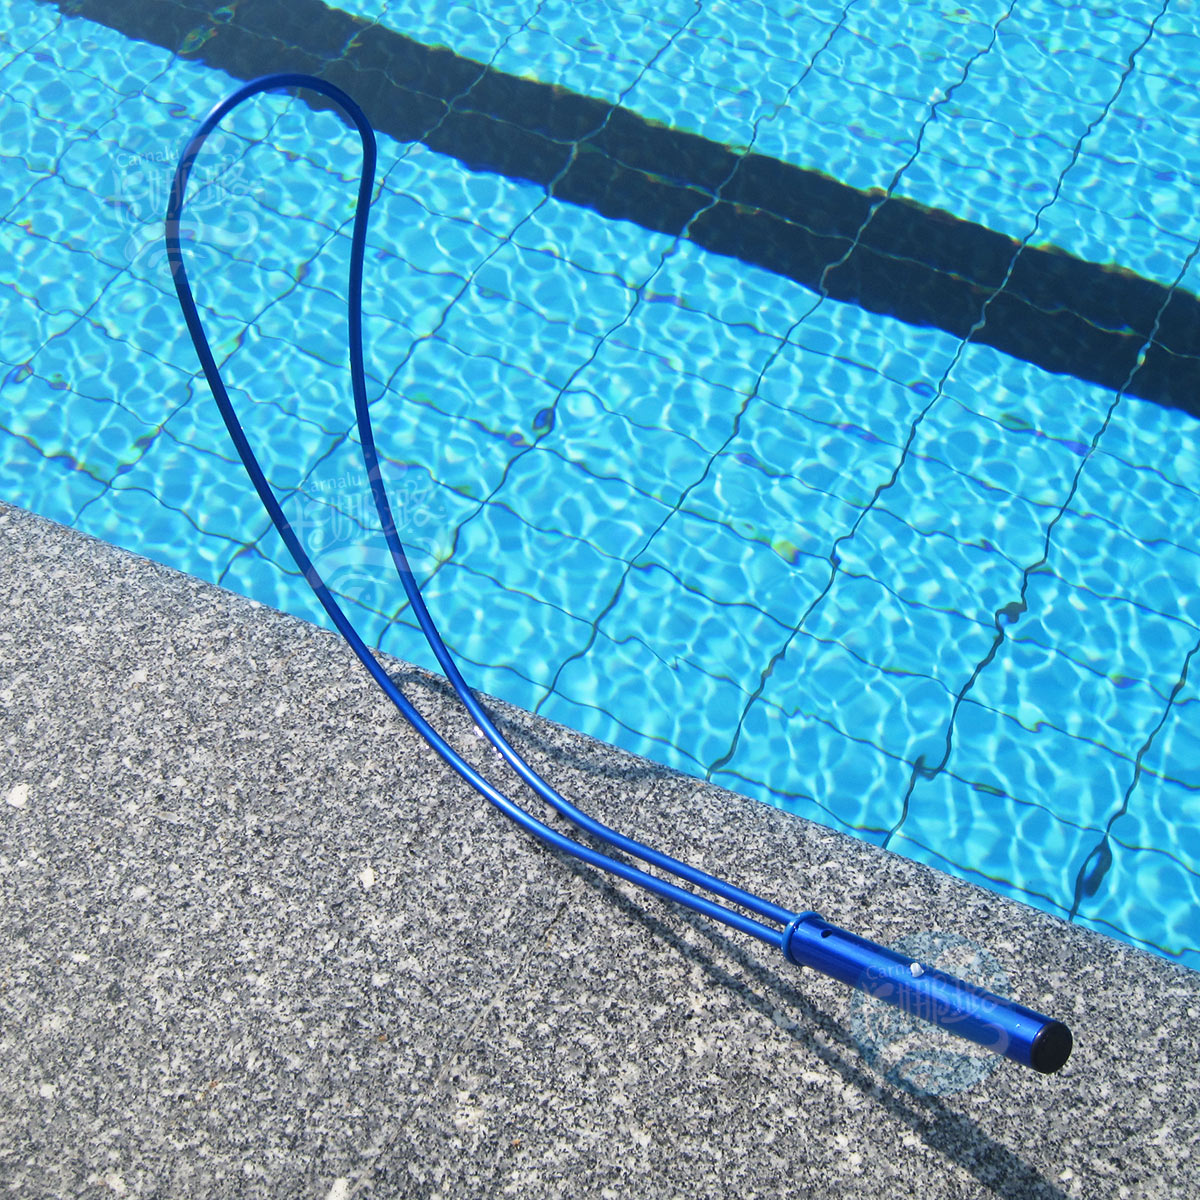 Swimming Pool Lifeguard Equipment Tool Life Saving Hook Telescopic Rod Aluminum Alloy Life